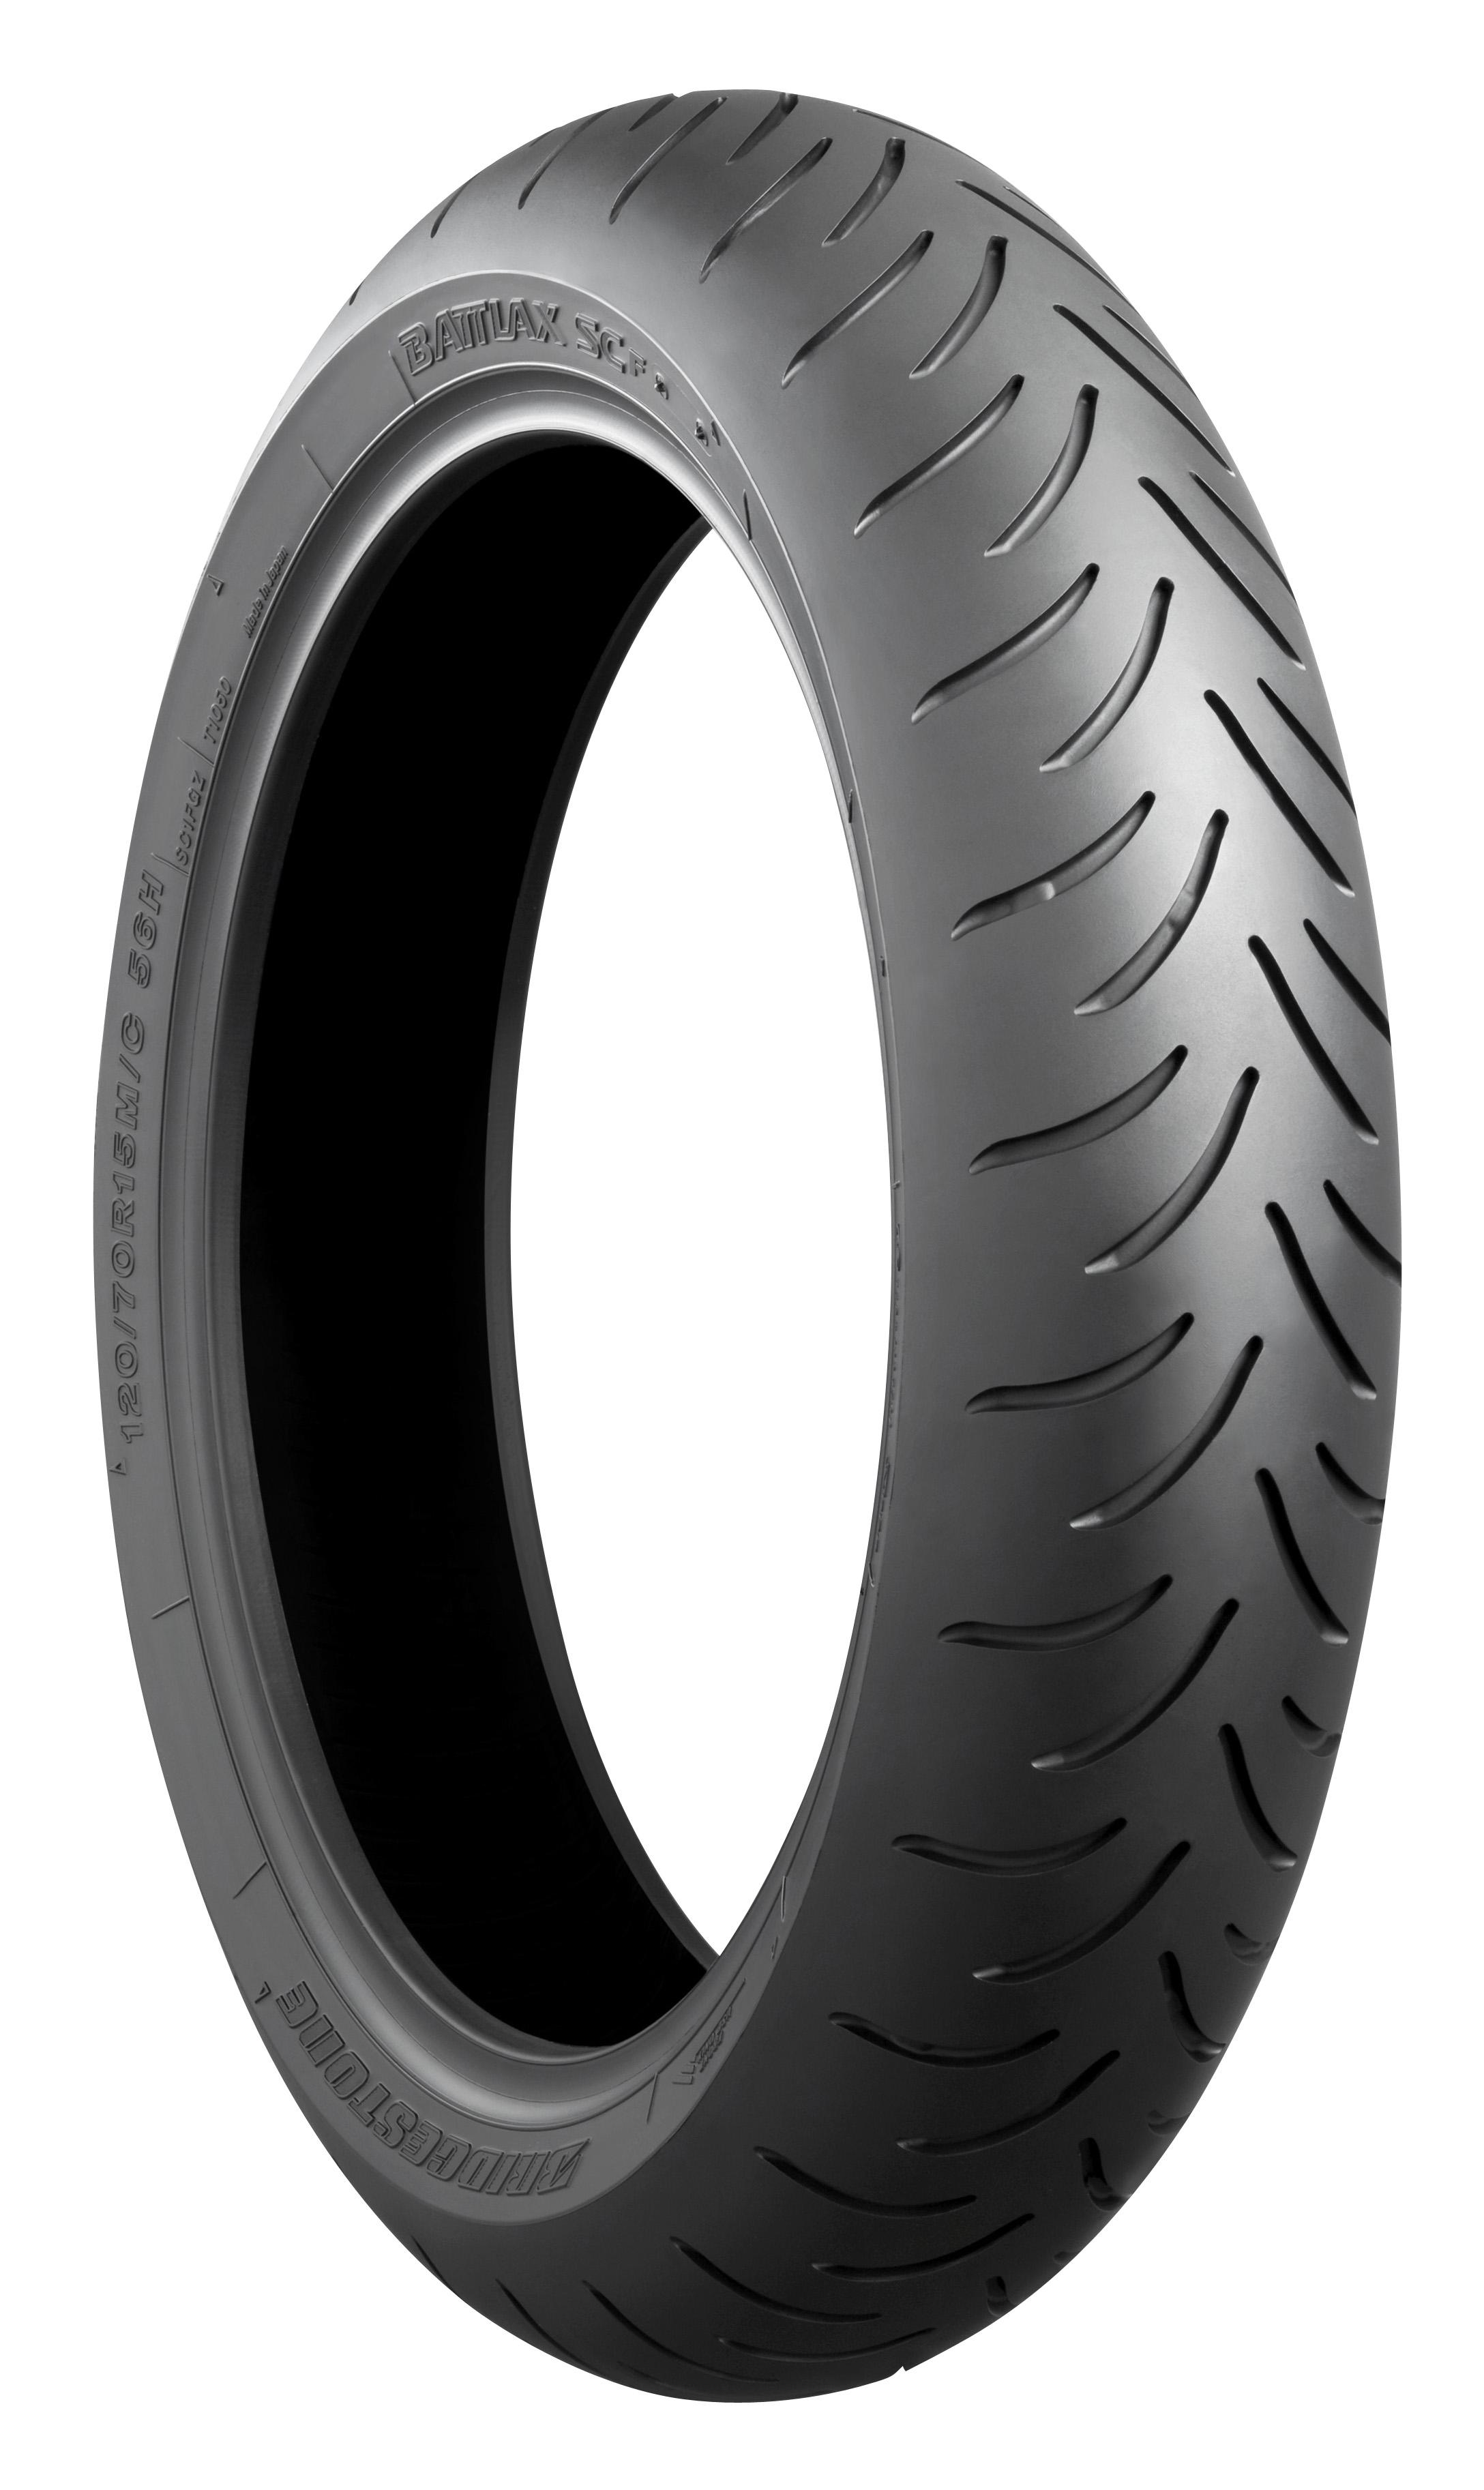 Bridgestone Battlax Scooter SC 80/90-14 (40P) Bias Front Tyre